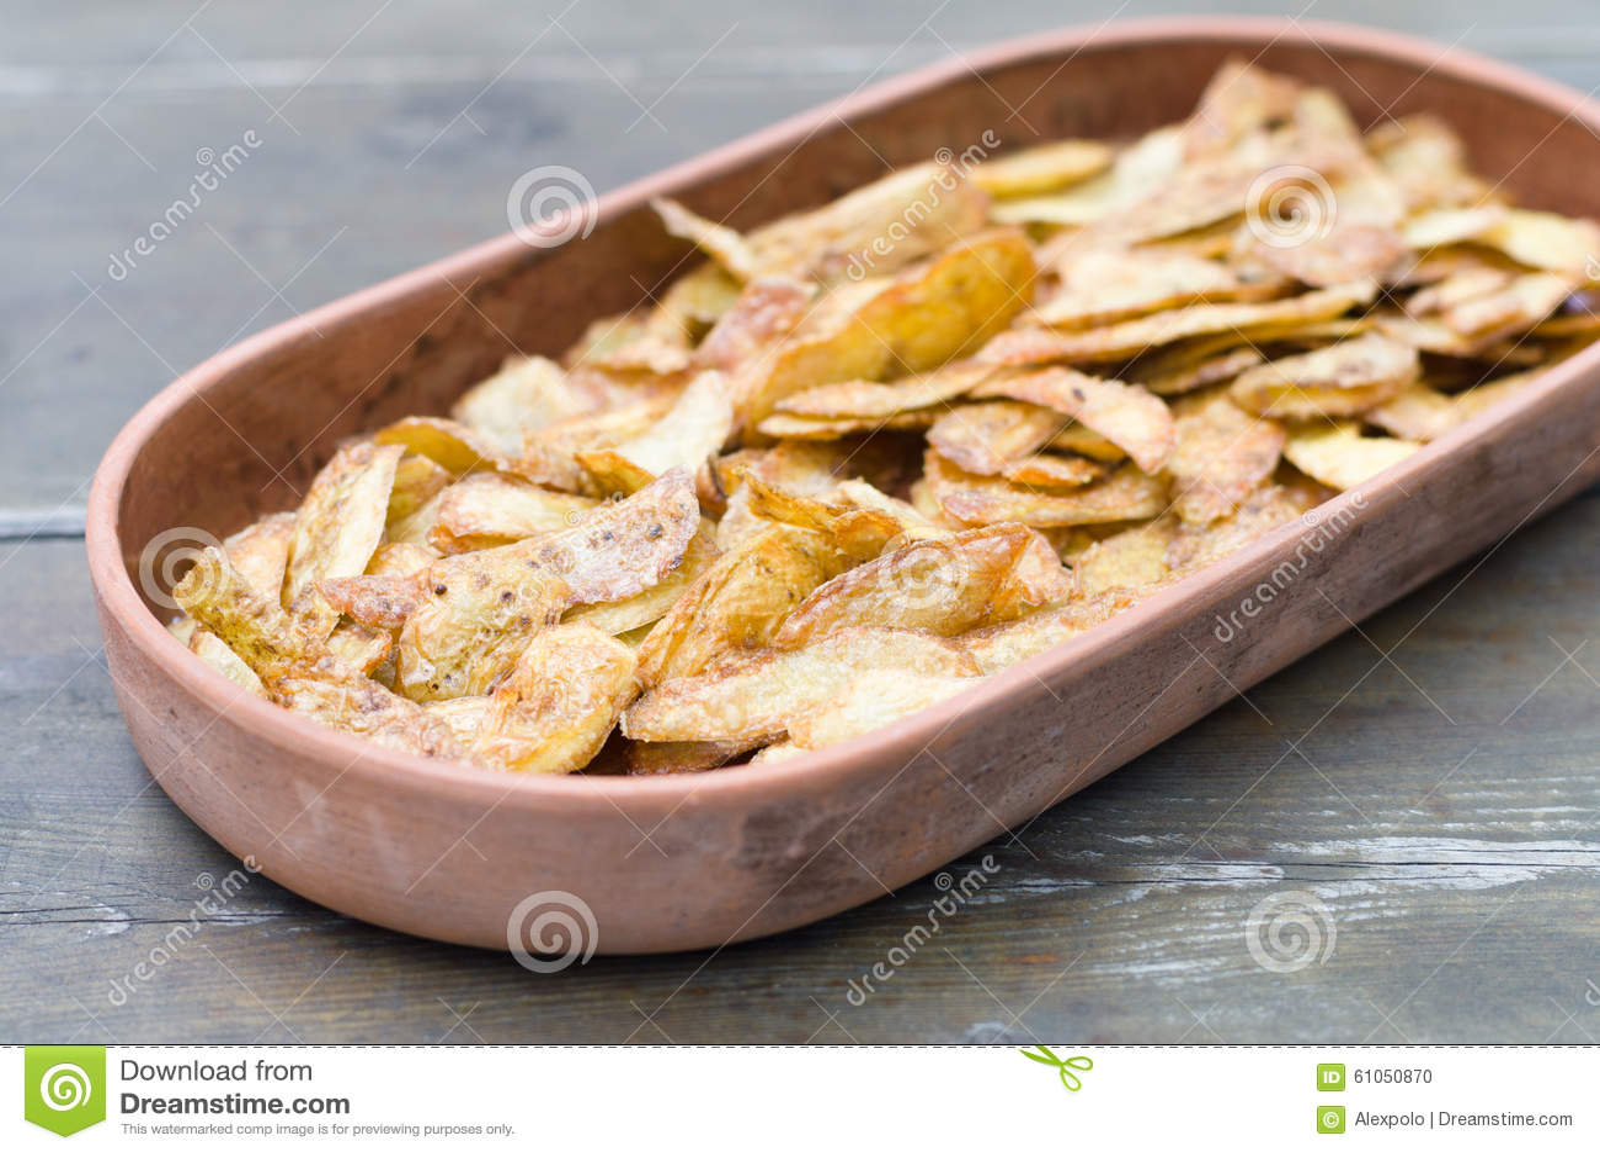 Pieles de patata curruscantes en loza